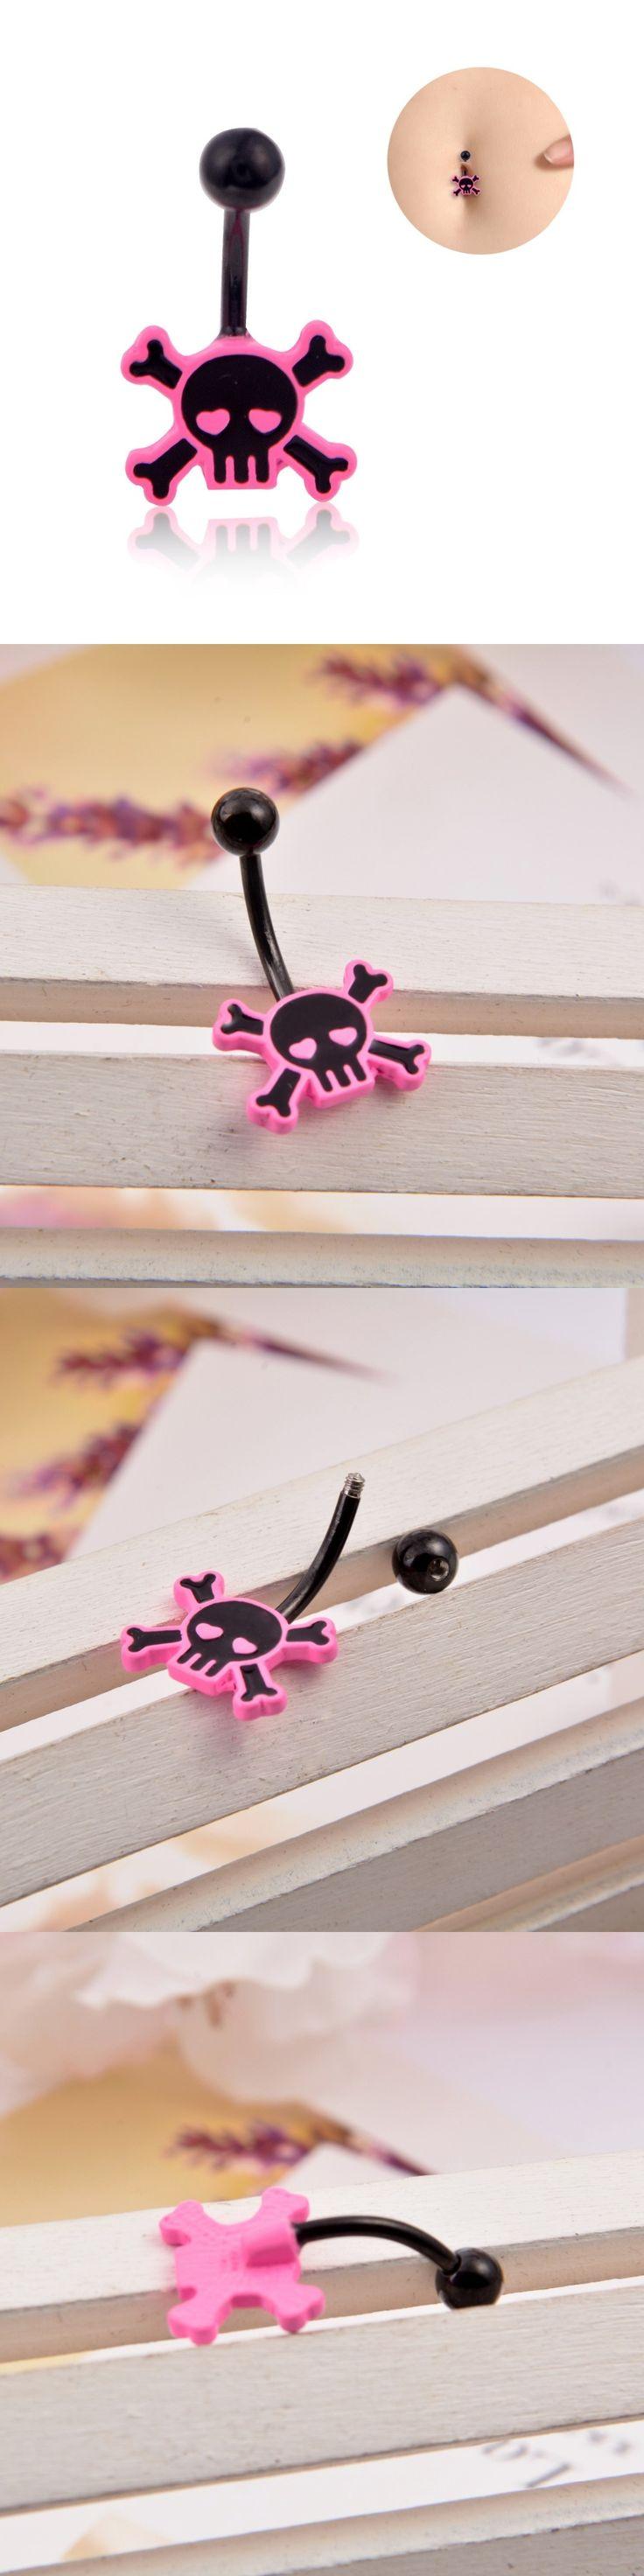 1pc Lovely Pink Skull Navel Piercing Nombril, Black Baking Belly Button Rings Sexy Belly Piercing Ombligo Navel Piercings